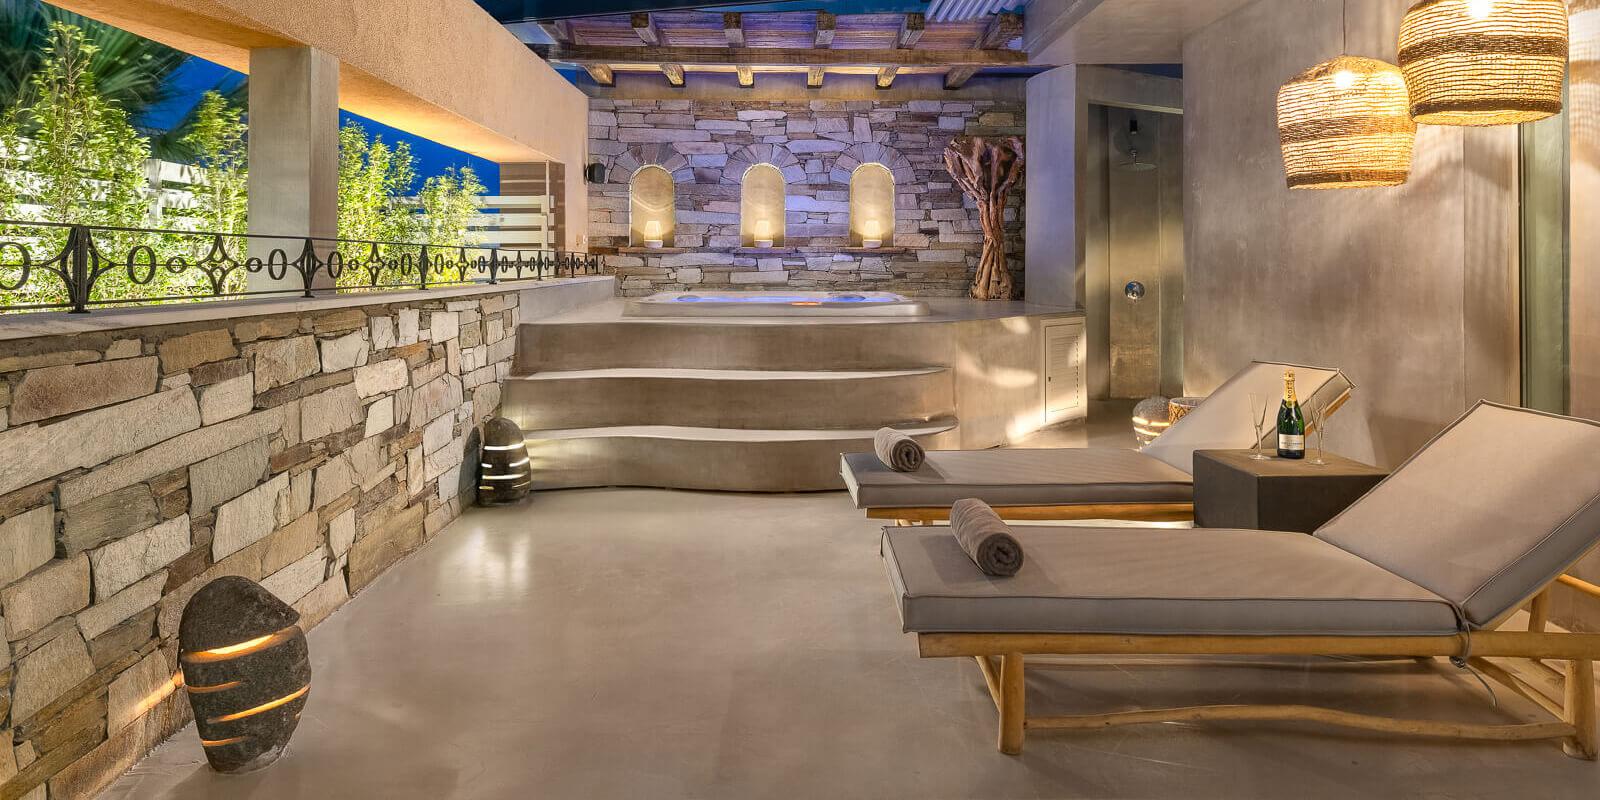 Helios-Suite-Private-Terrace-Elakati-Hotel-in-Rhodes-Greece-1